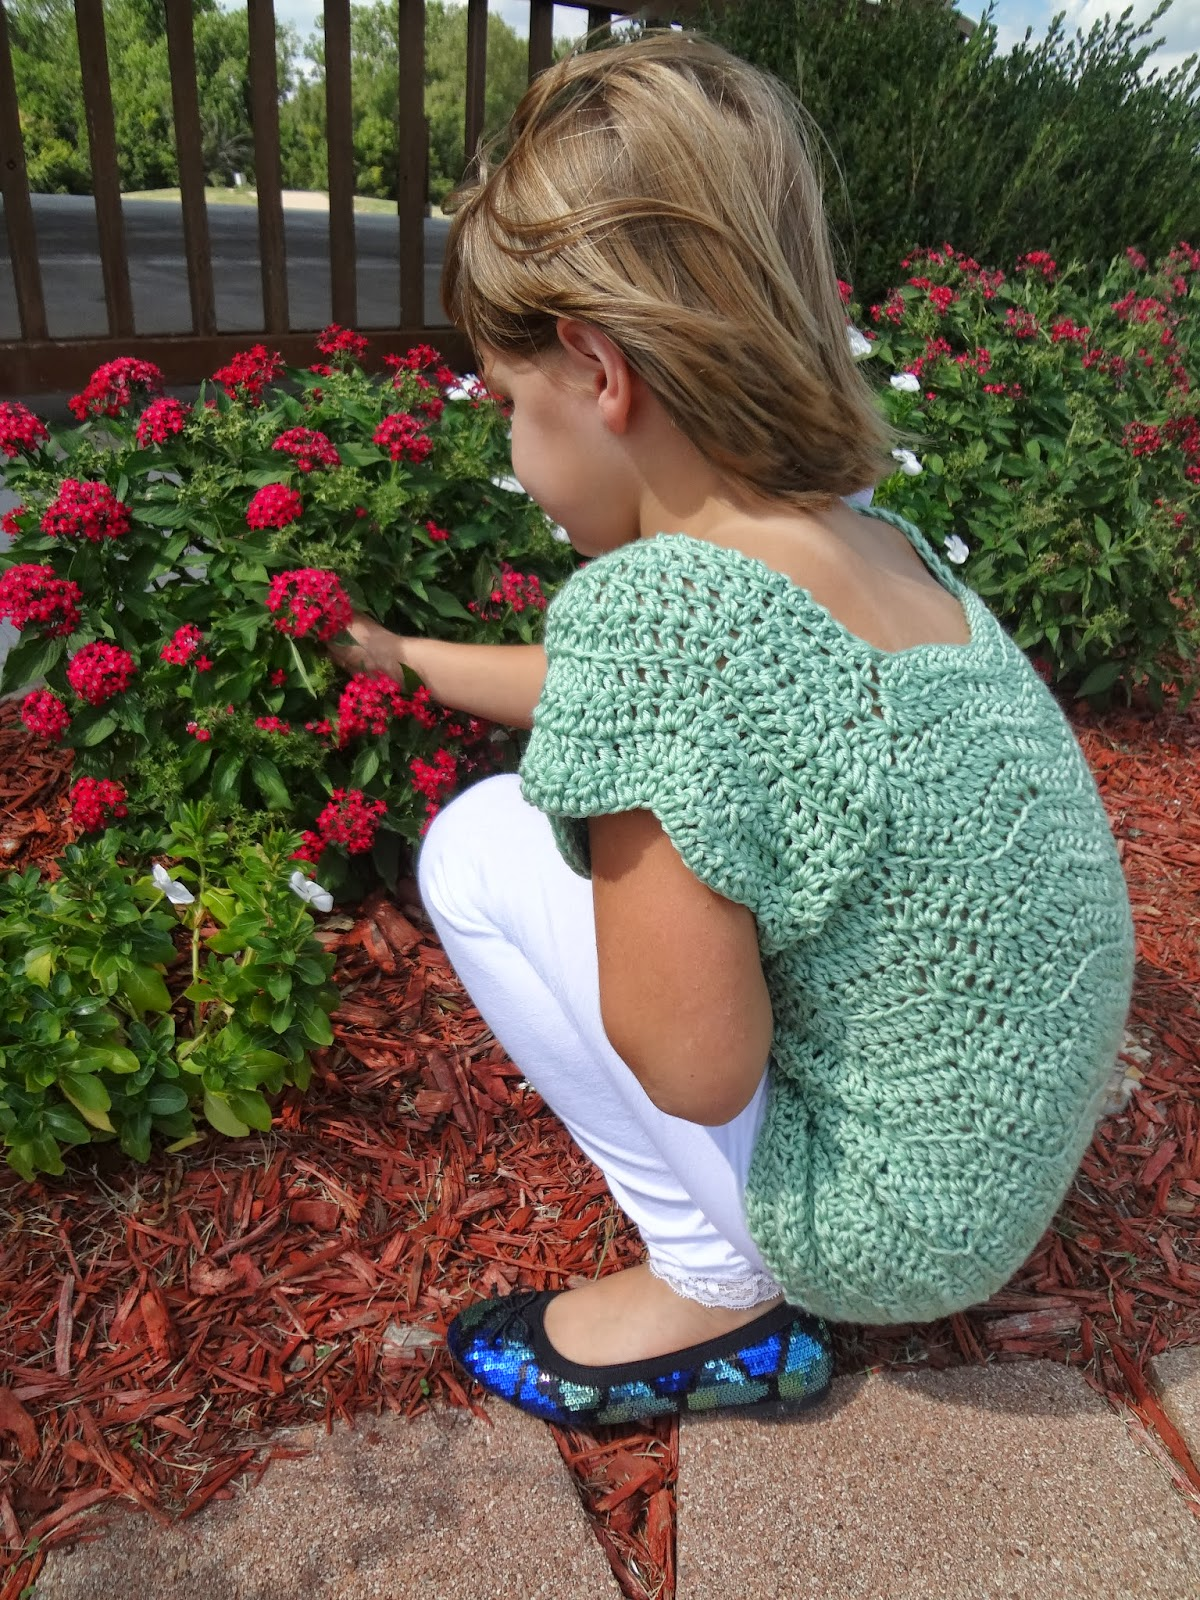 Ripple stitch crochet top pattern for children from Banana Moon Studio.